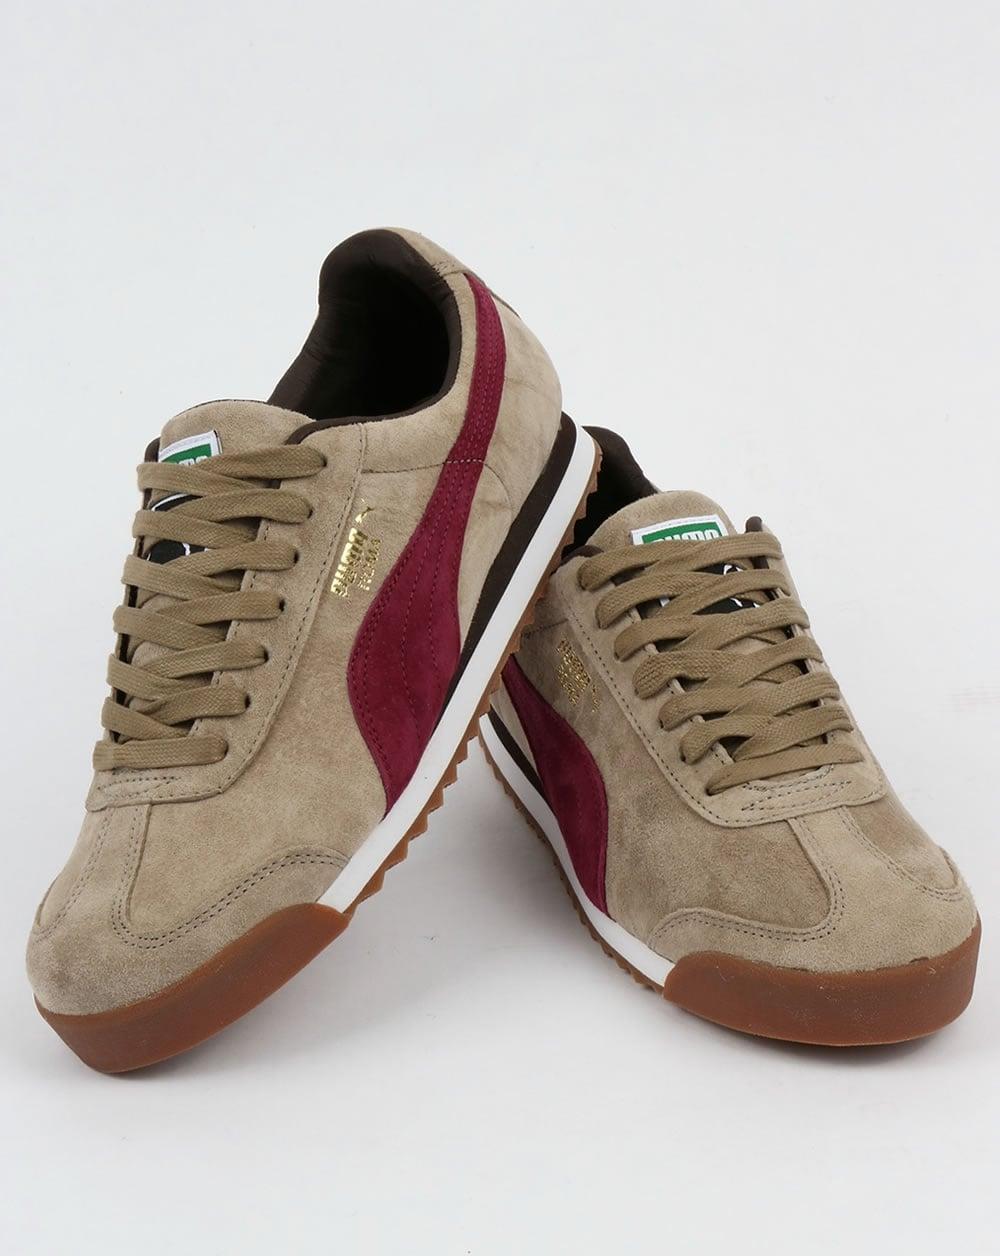 Chinchilla For Sale >> Puma Roma Trainers Chinchilla Brown/Burgundy,shoes ...